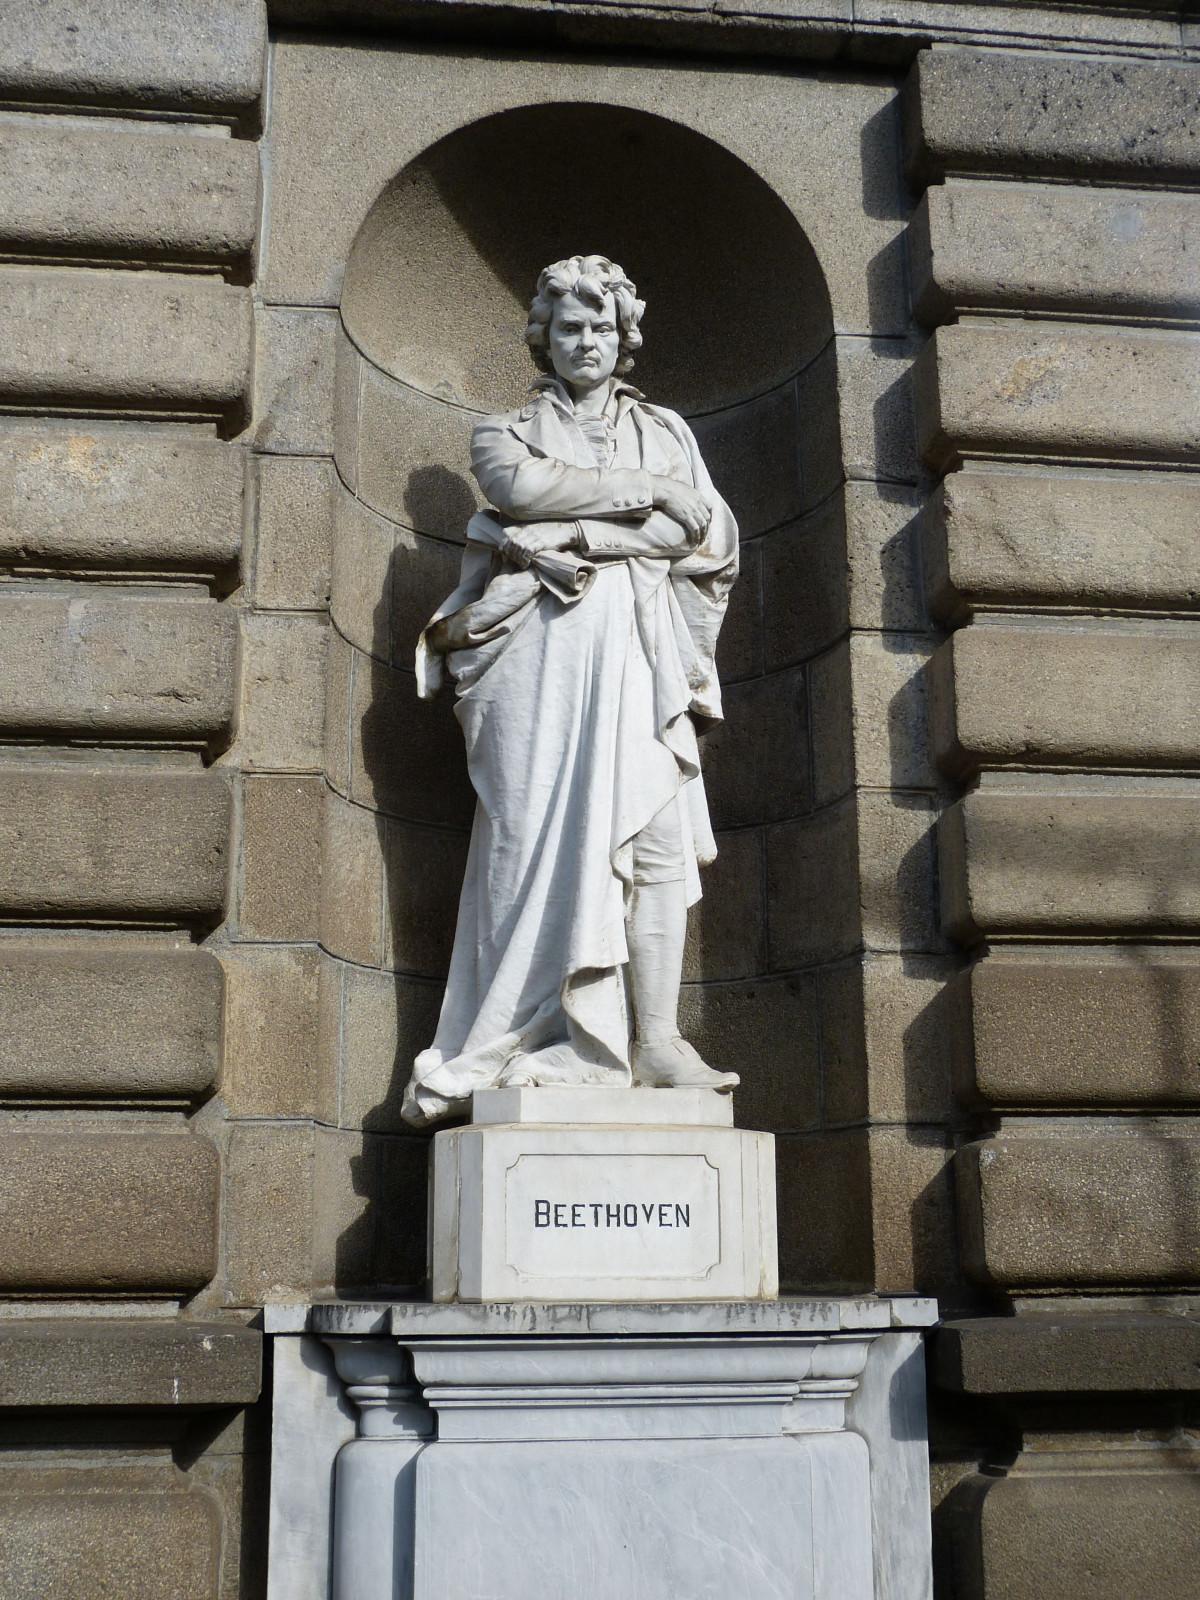 Free Images  Stone, Statue, Musician, Sculpture, Memorial -7863